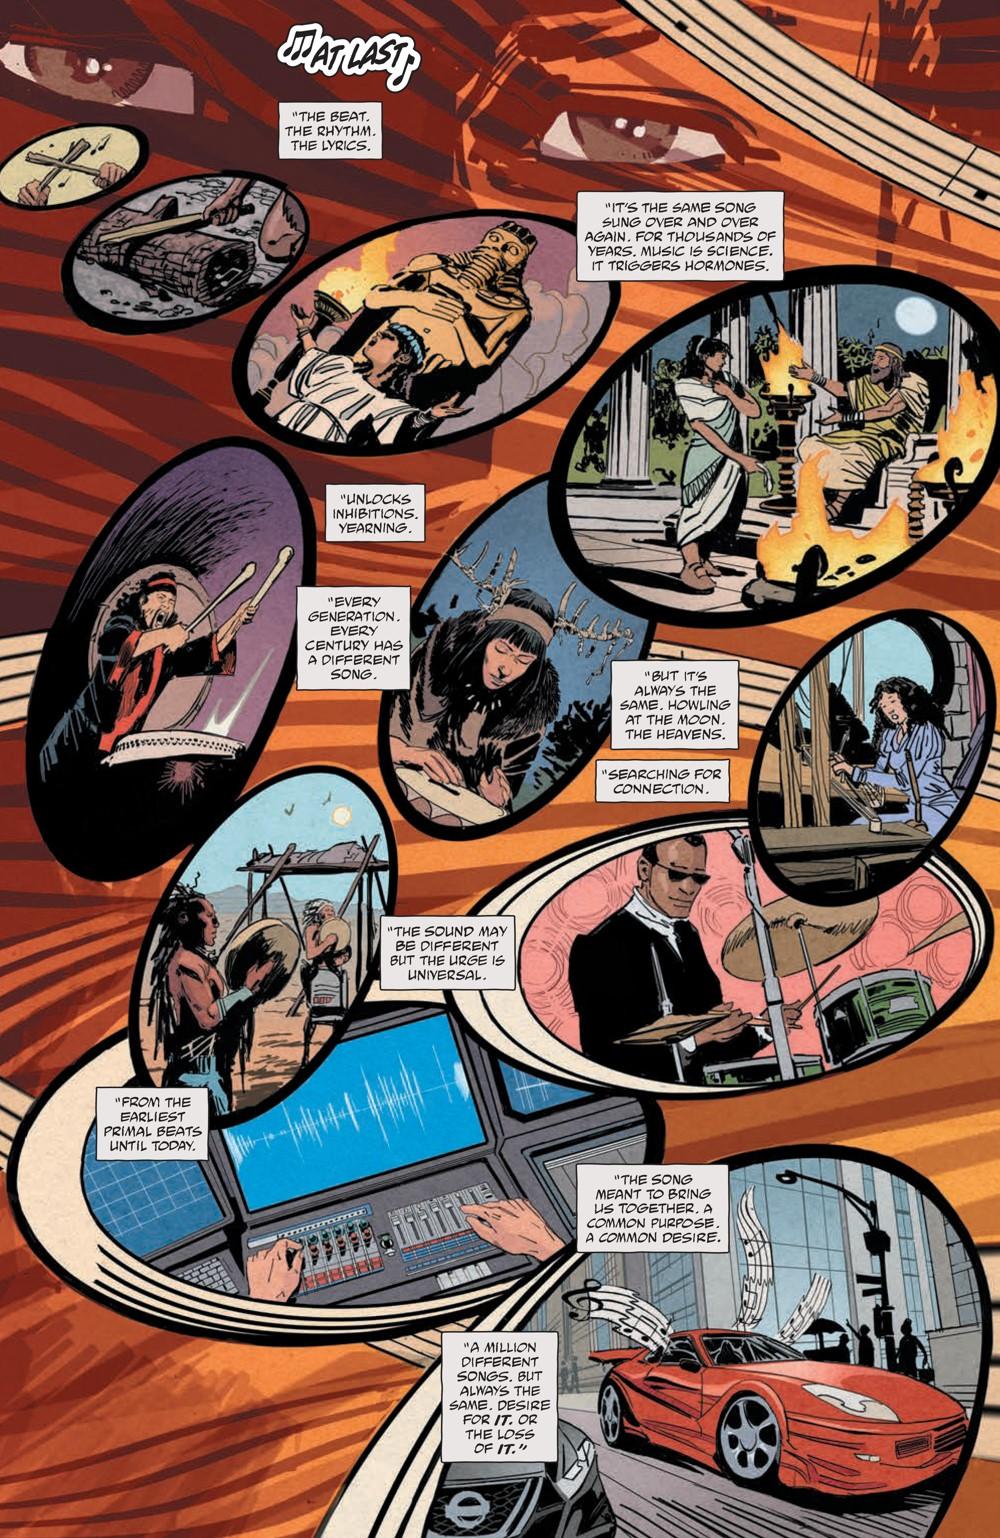 BRZRKR_005_PRESS_7 ComicList Previews: BRZRKR #5 (Of 12)